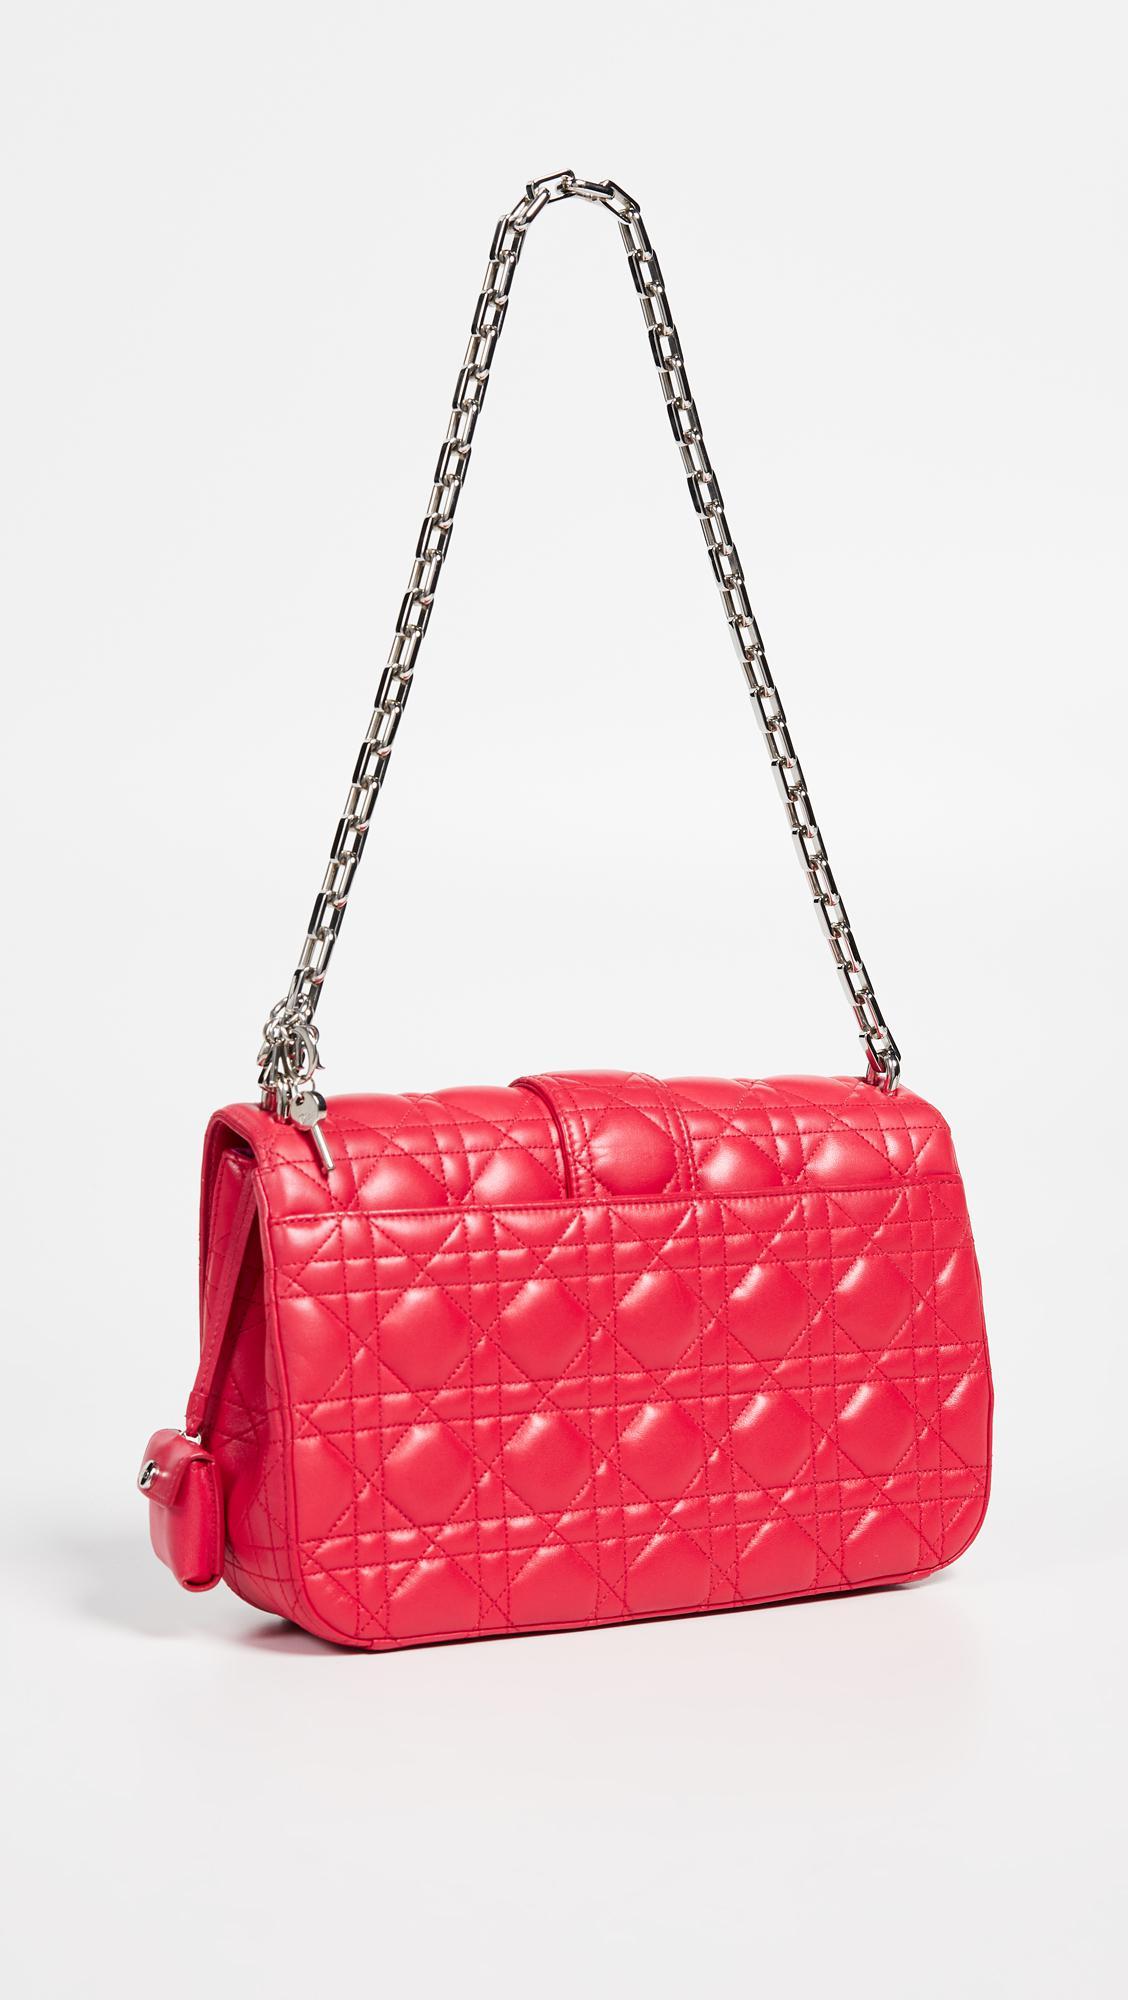 0390ac8028a5 What Goes Around Comes Around - Dior Pink Lambskin Miss Dior Medium Bag -  Lyst. View fullscreen